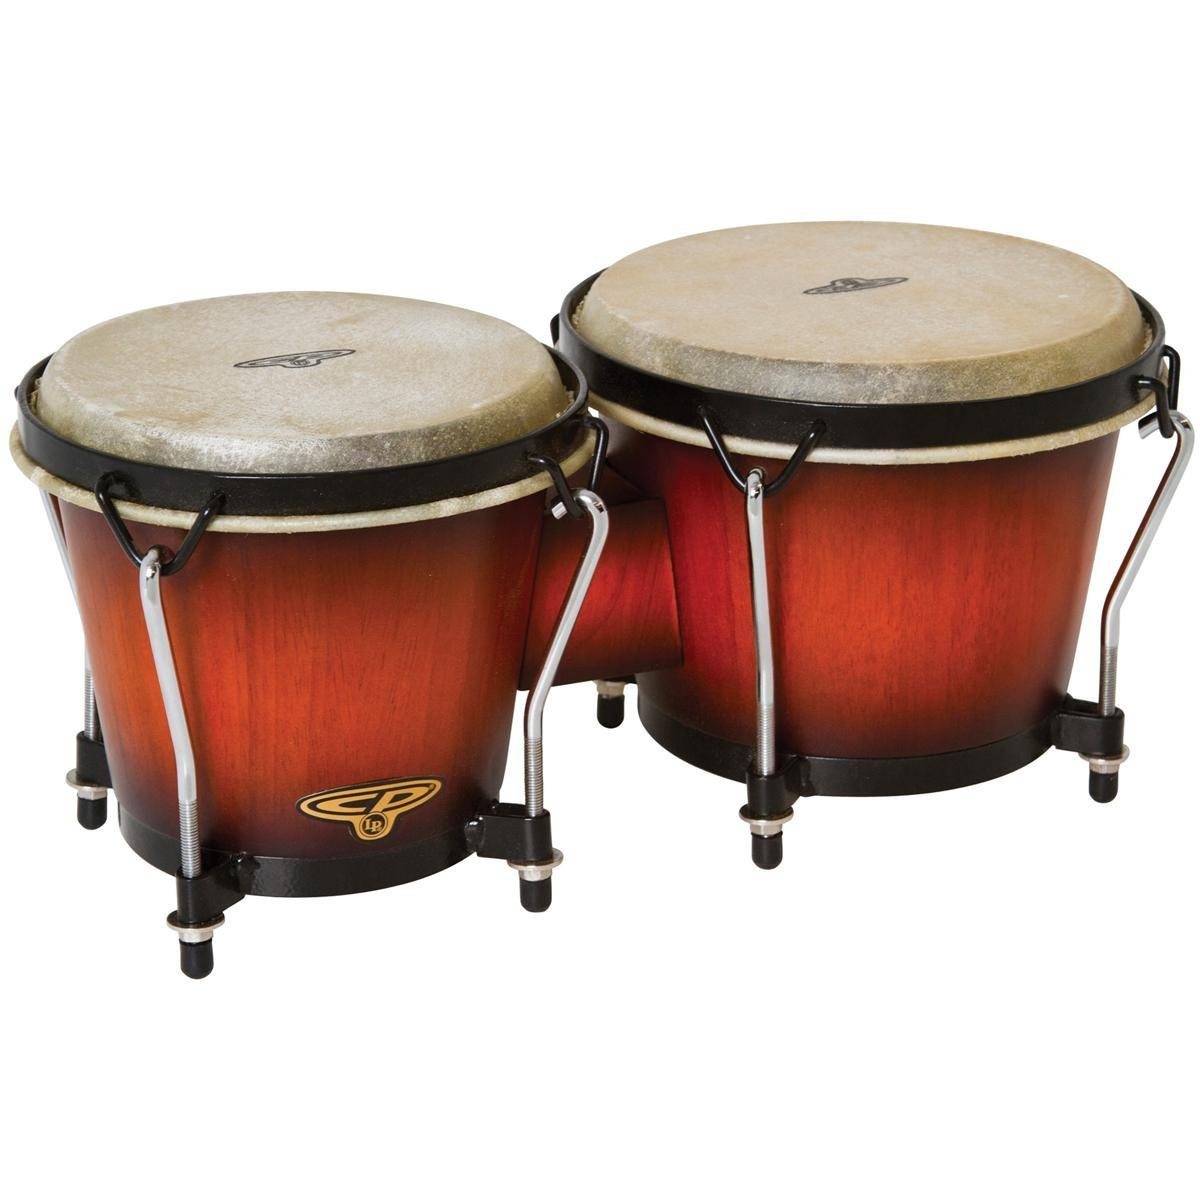 Latin Percussion CP221VSB Traditional Bongos - Vintage Sunburst